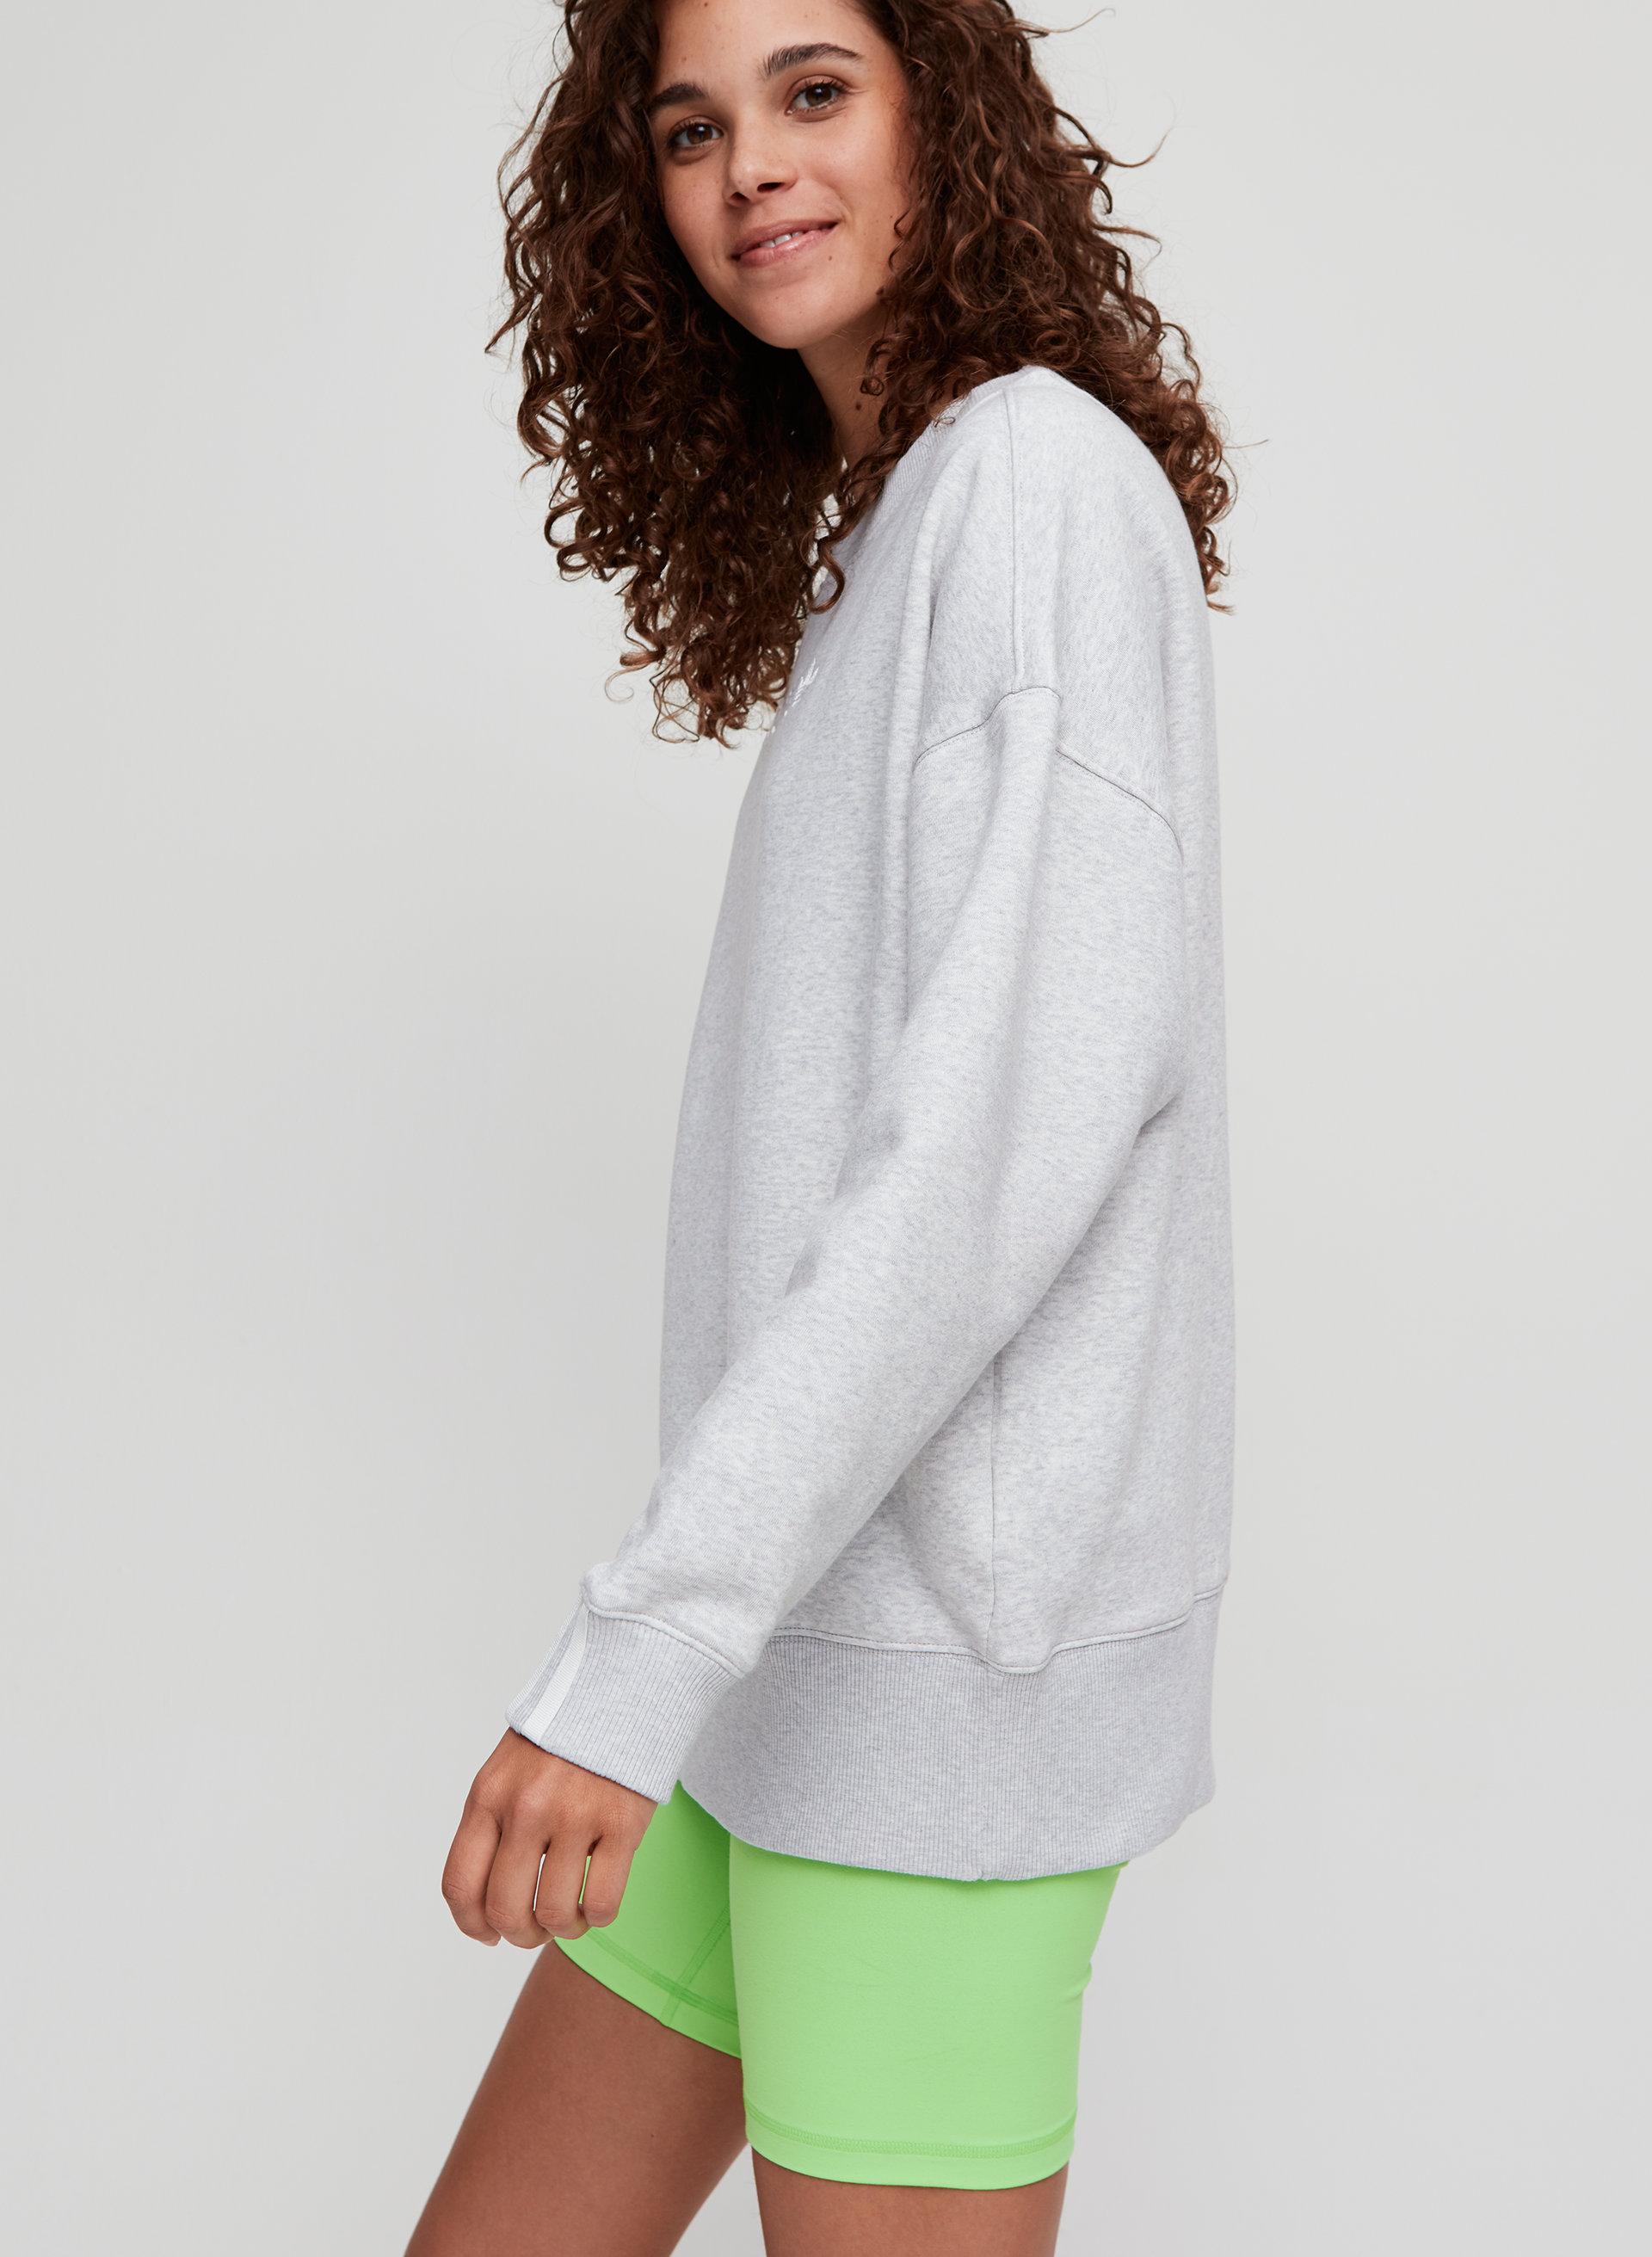 adidas sweats and sweater